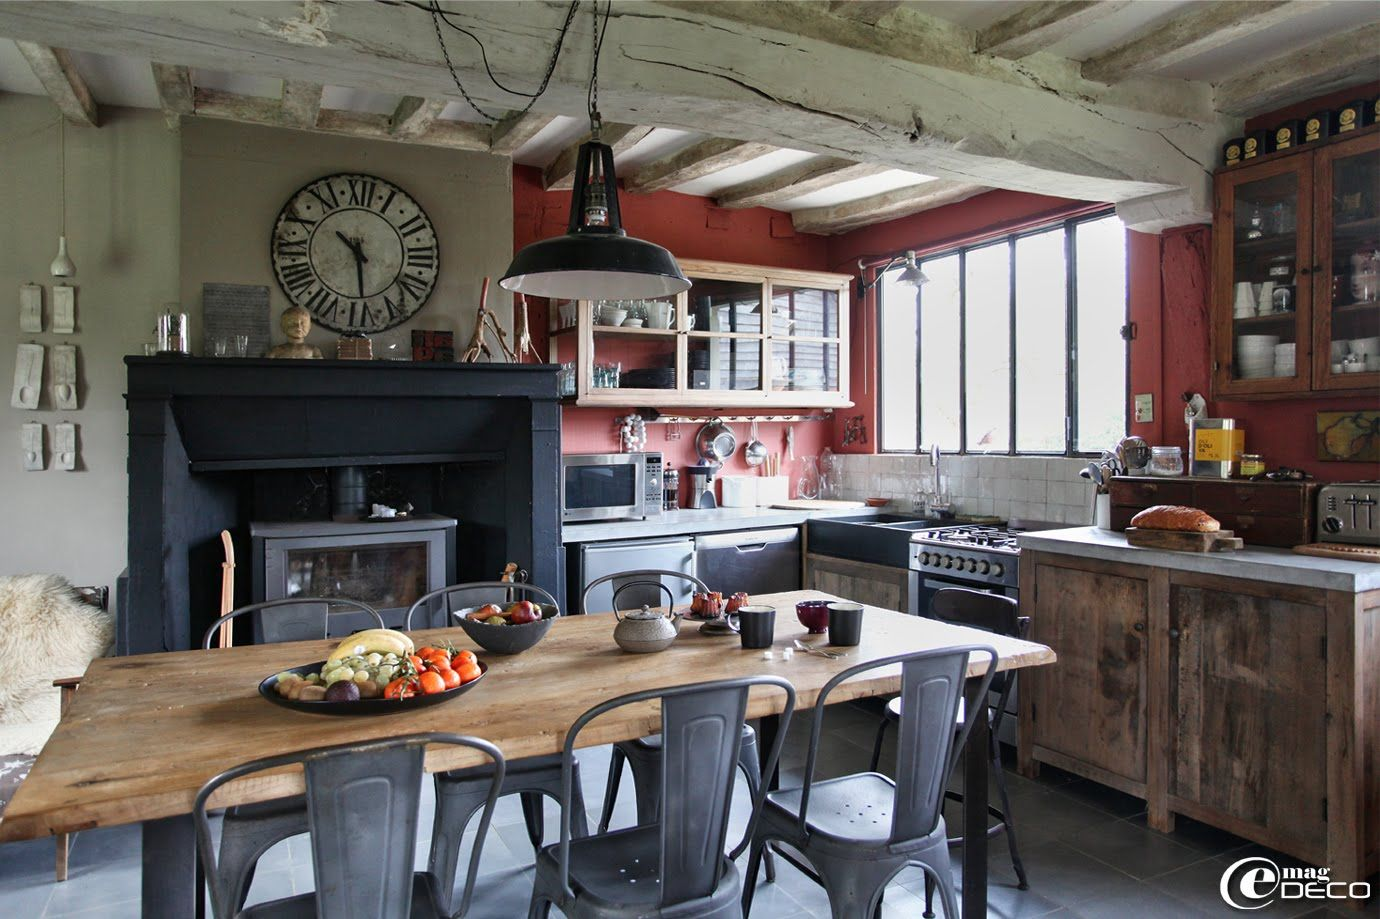 vieille cuisine repeinte renover vieille cuisine